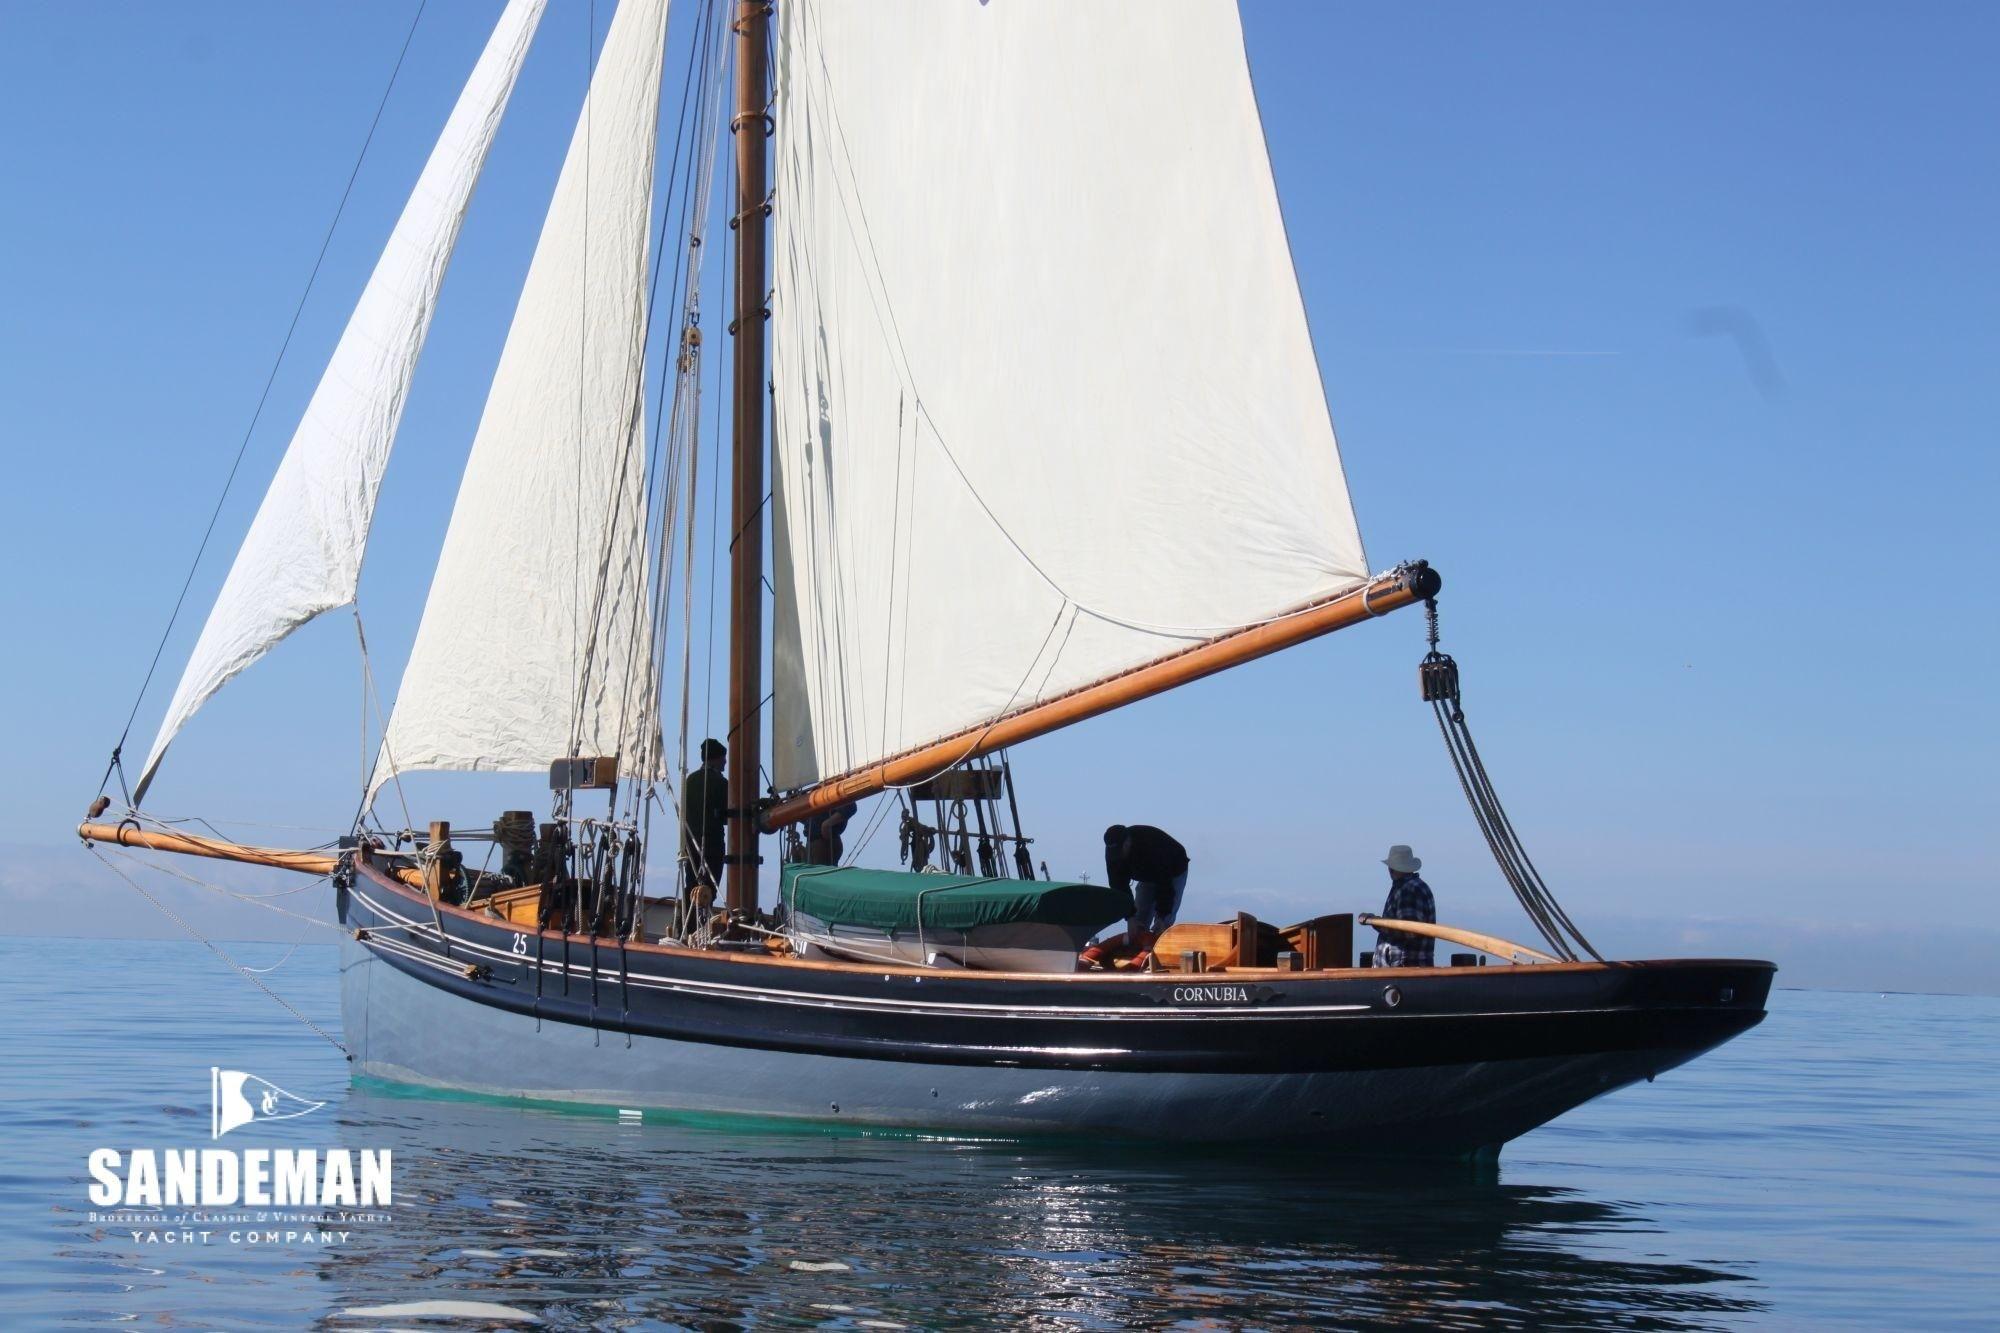 Dealers Near Me >> 1911 Bristol Channel Pilot Cutter Sail Boat For Sale - www.yachtworld.com